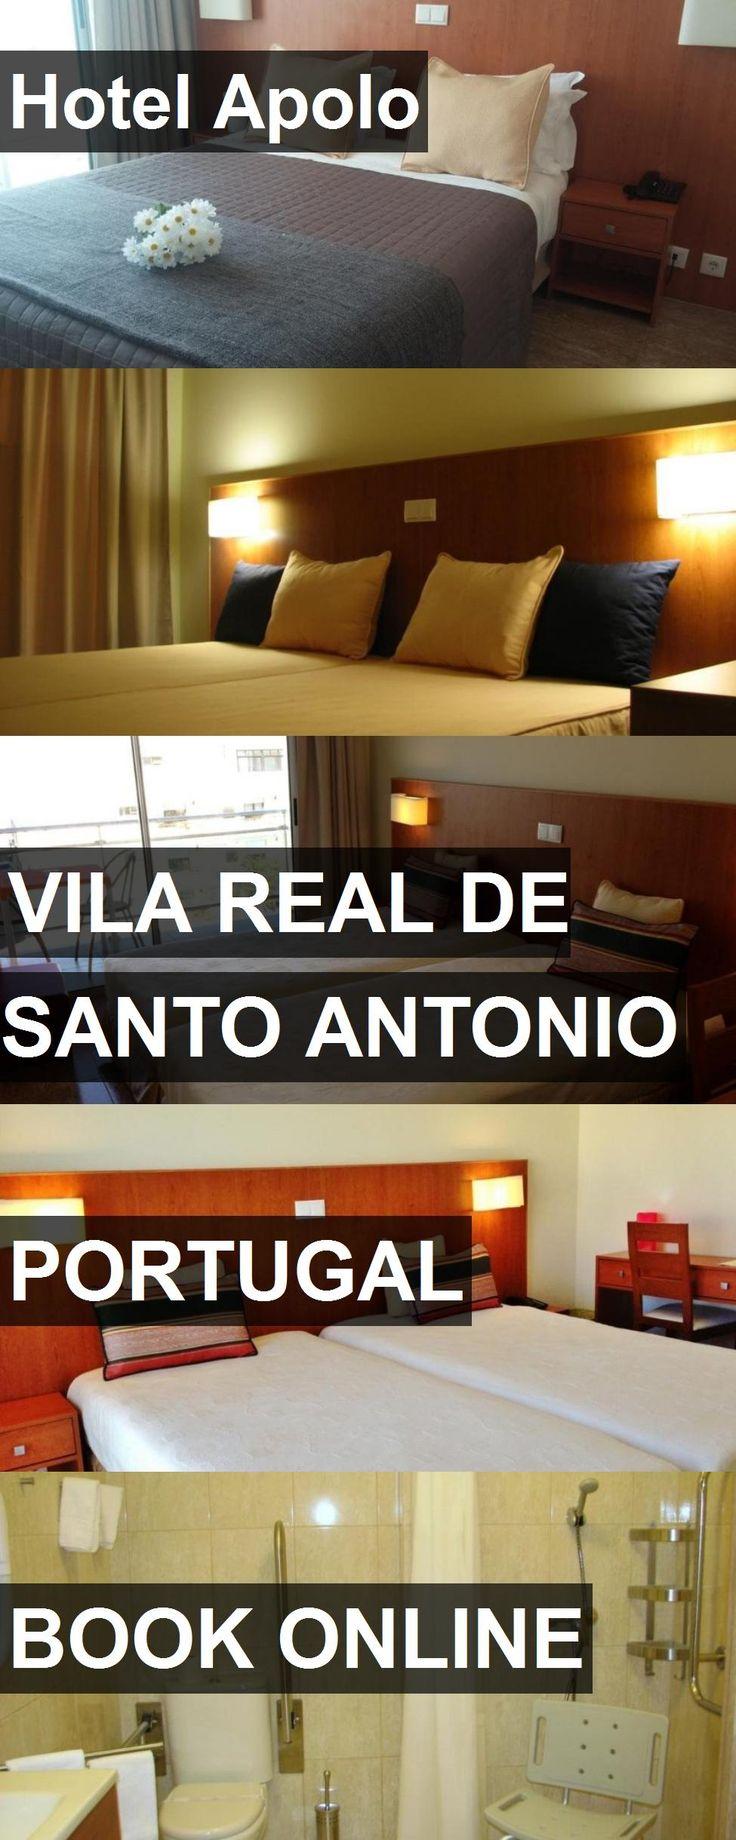 Hotel Apolo in Vila Real de Santo Antonio, Portugal. For more information, photos, reviews and best prices please follow the link. #Portugal #VilaRealdeSantoAntonio #travel #vacation #hotel